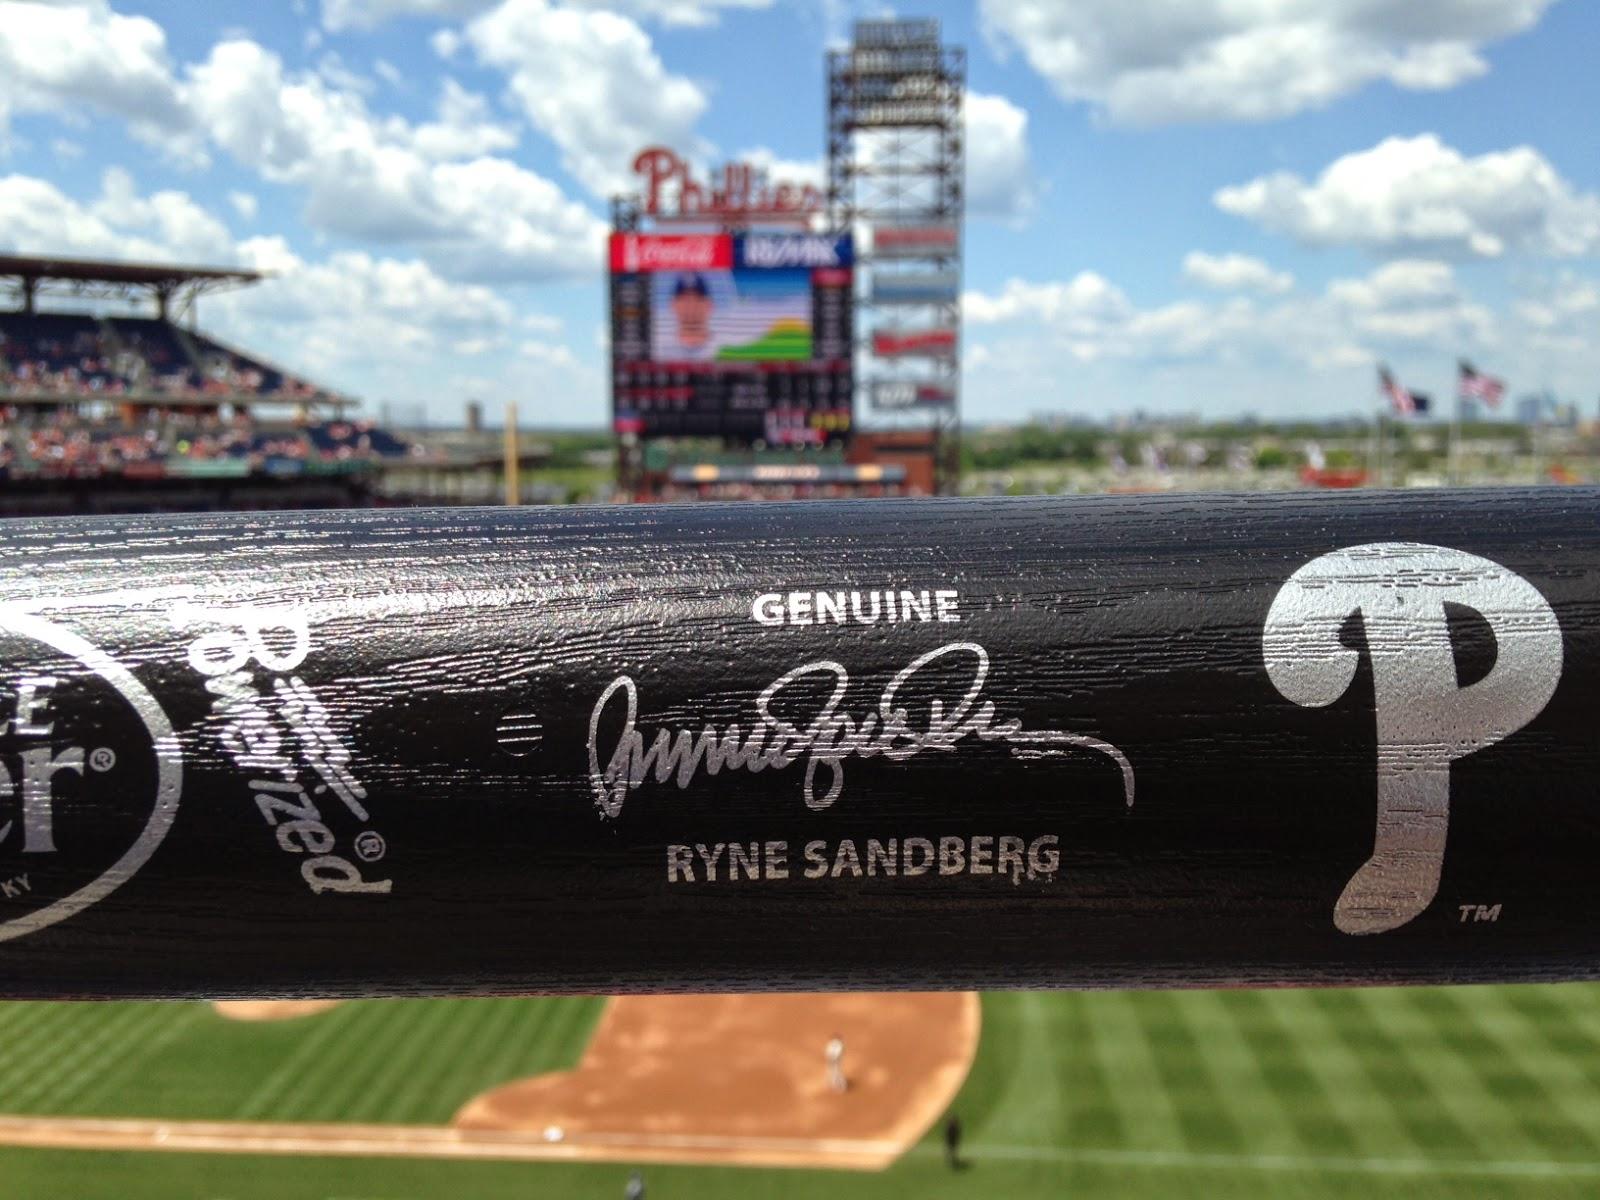 Ryne Sandberg autographed bat